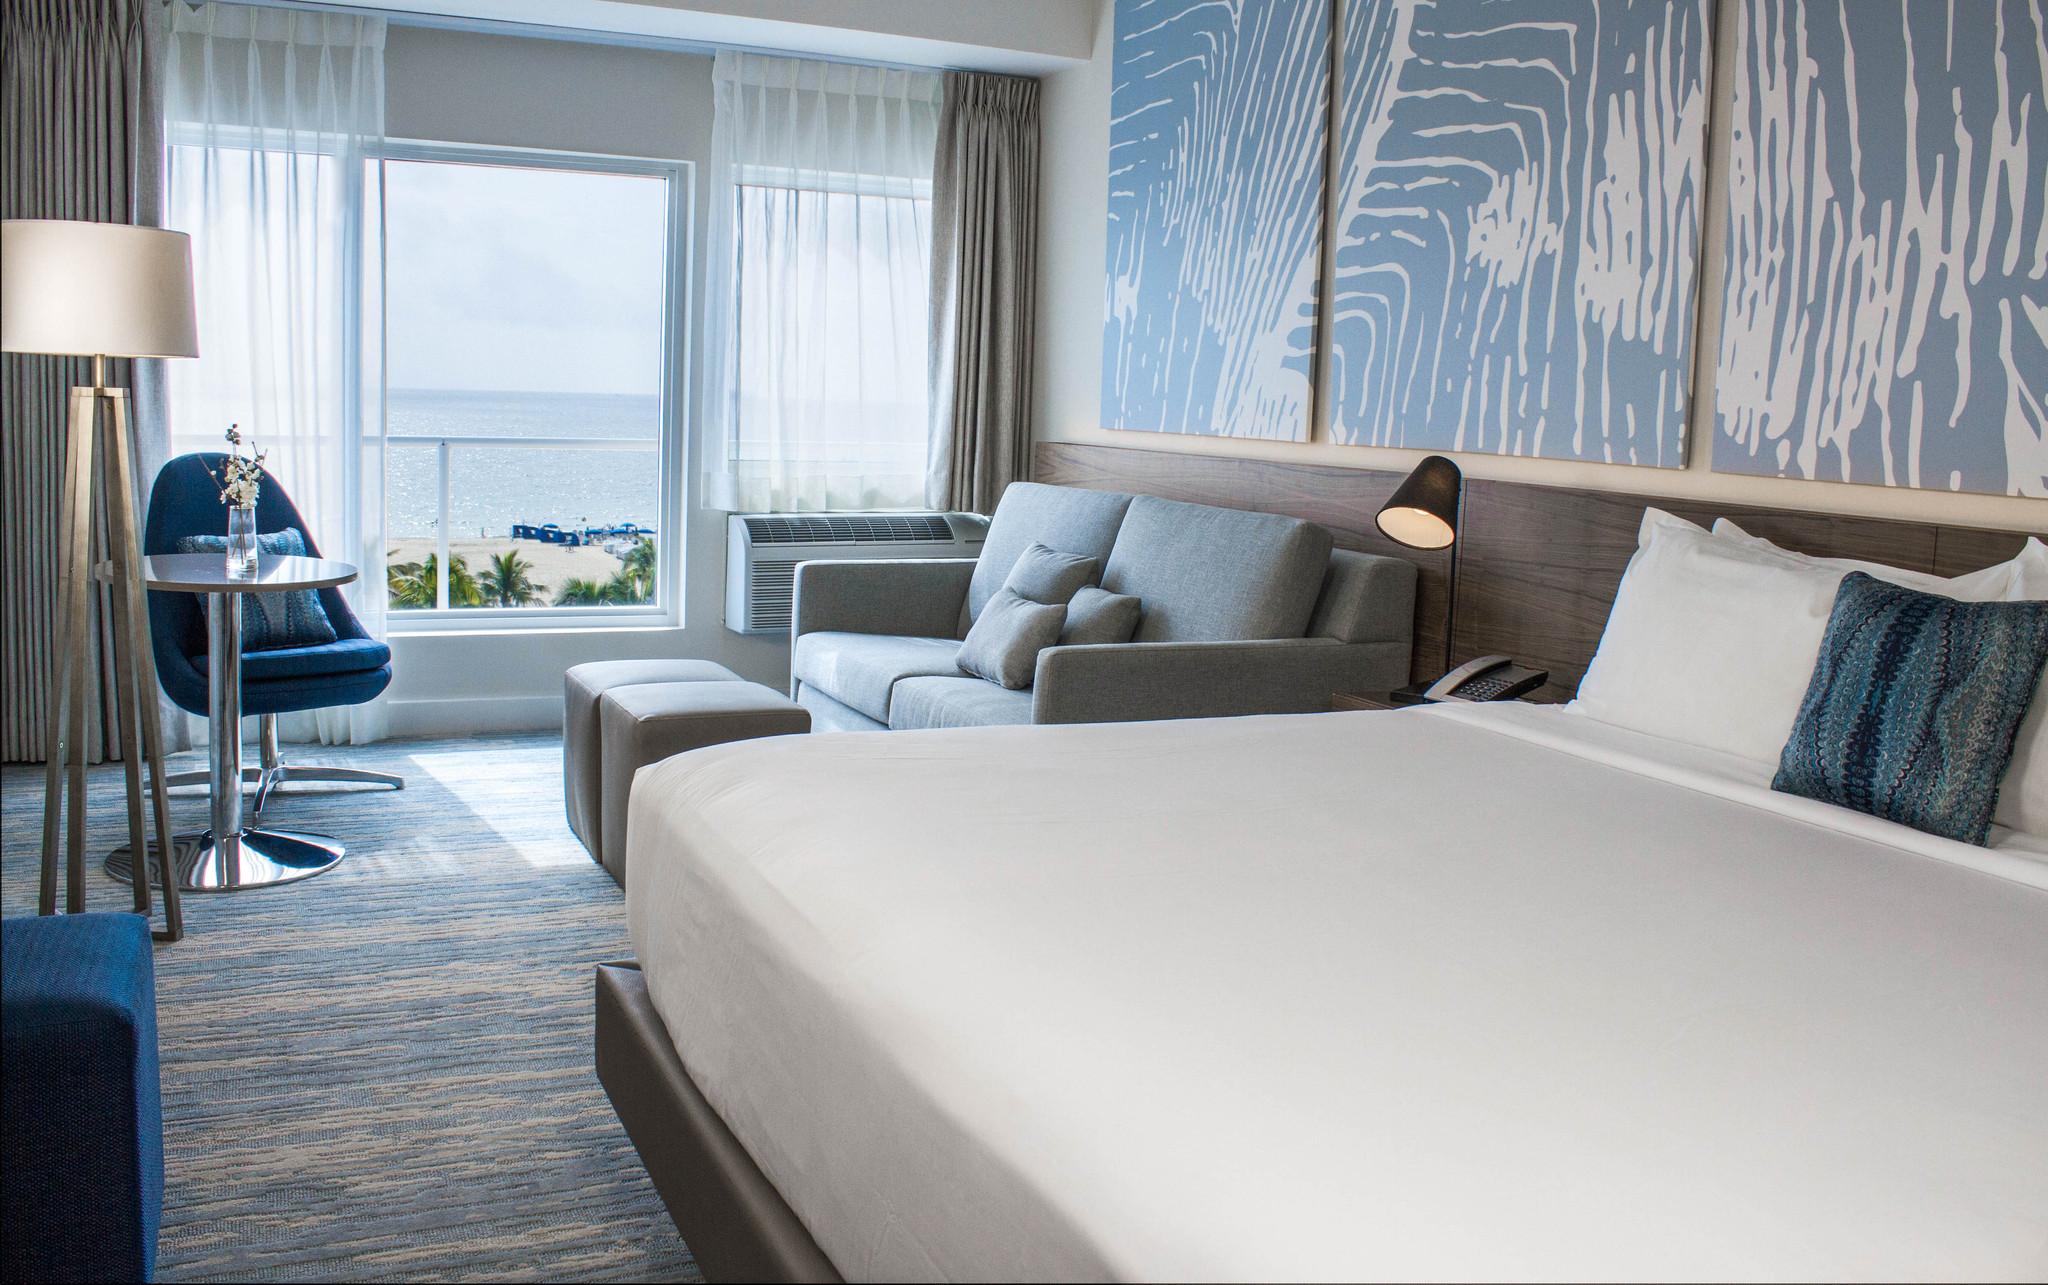 Fort Lauderdale S B Ocean Resort Begins Significant Renovation Project Sun Sentinel